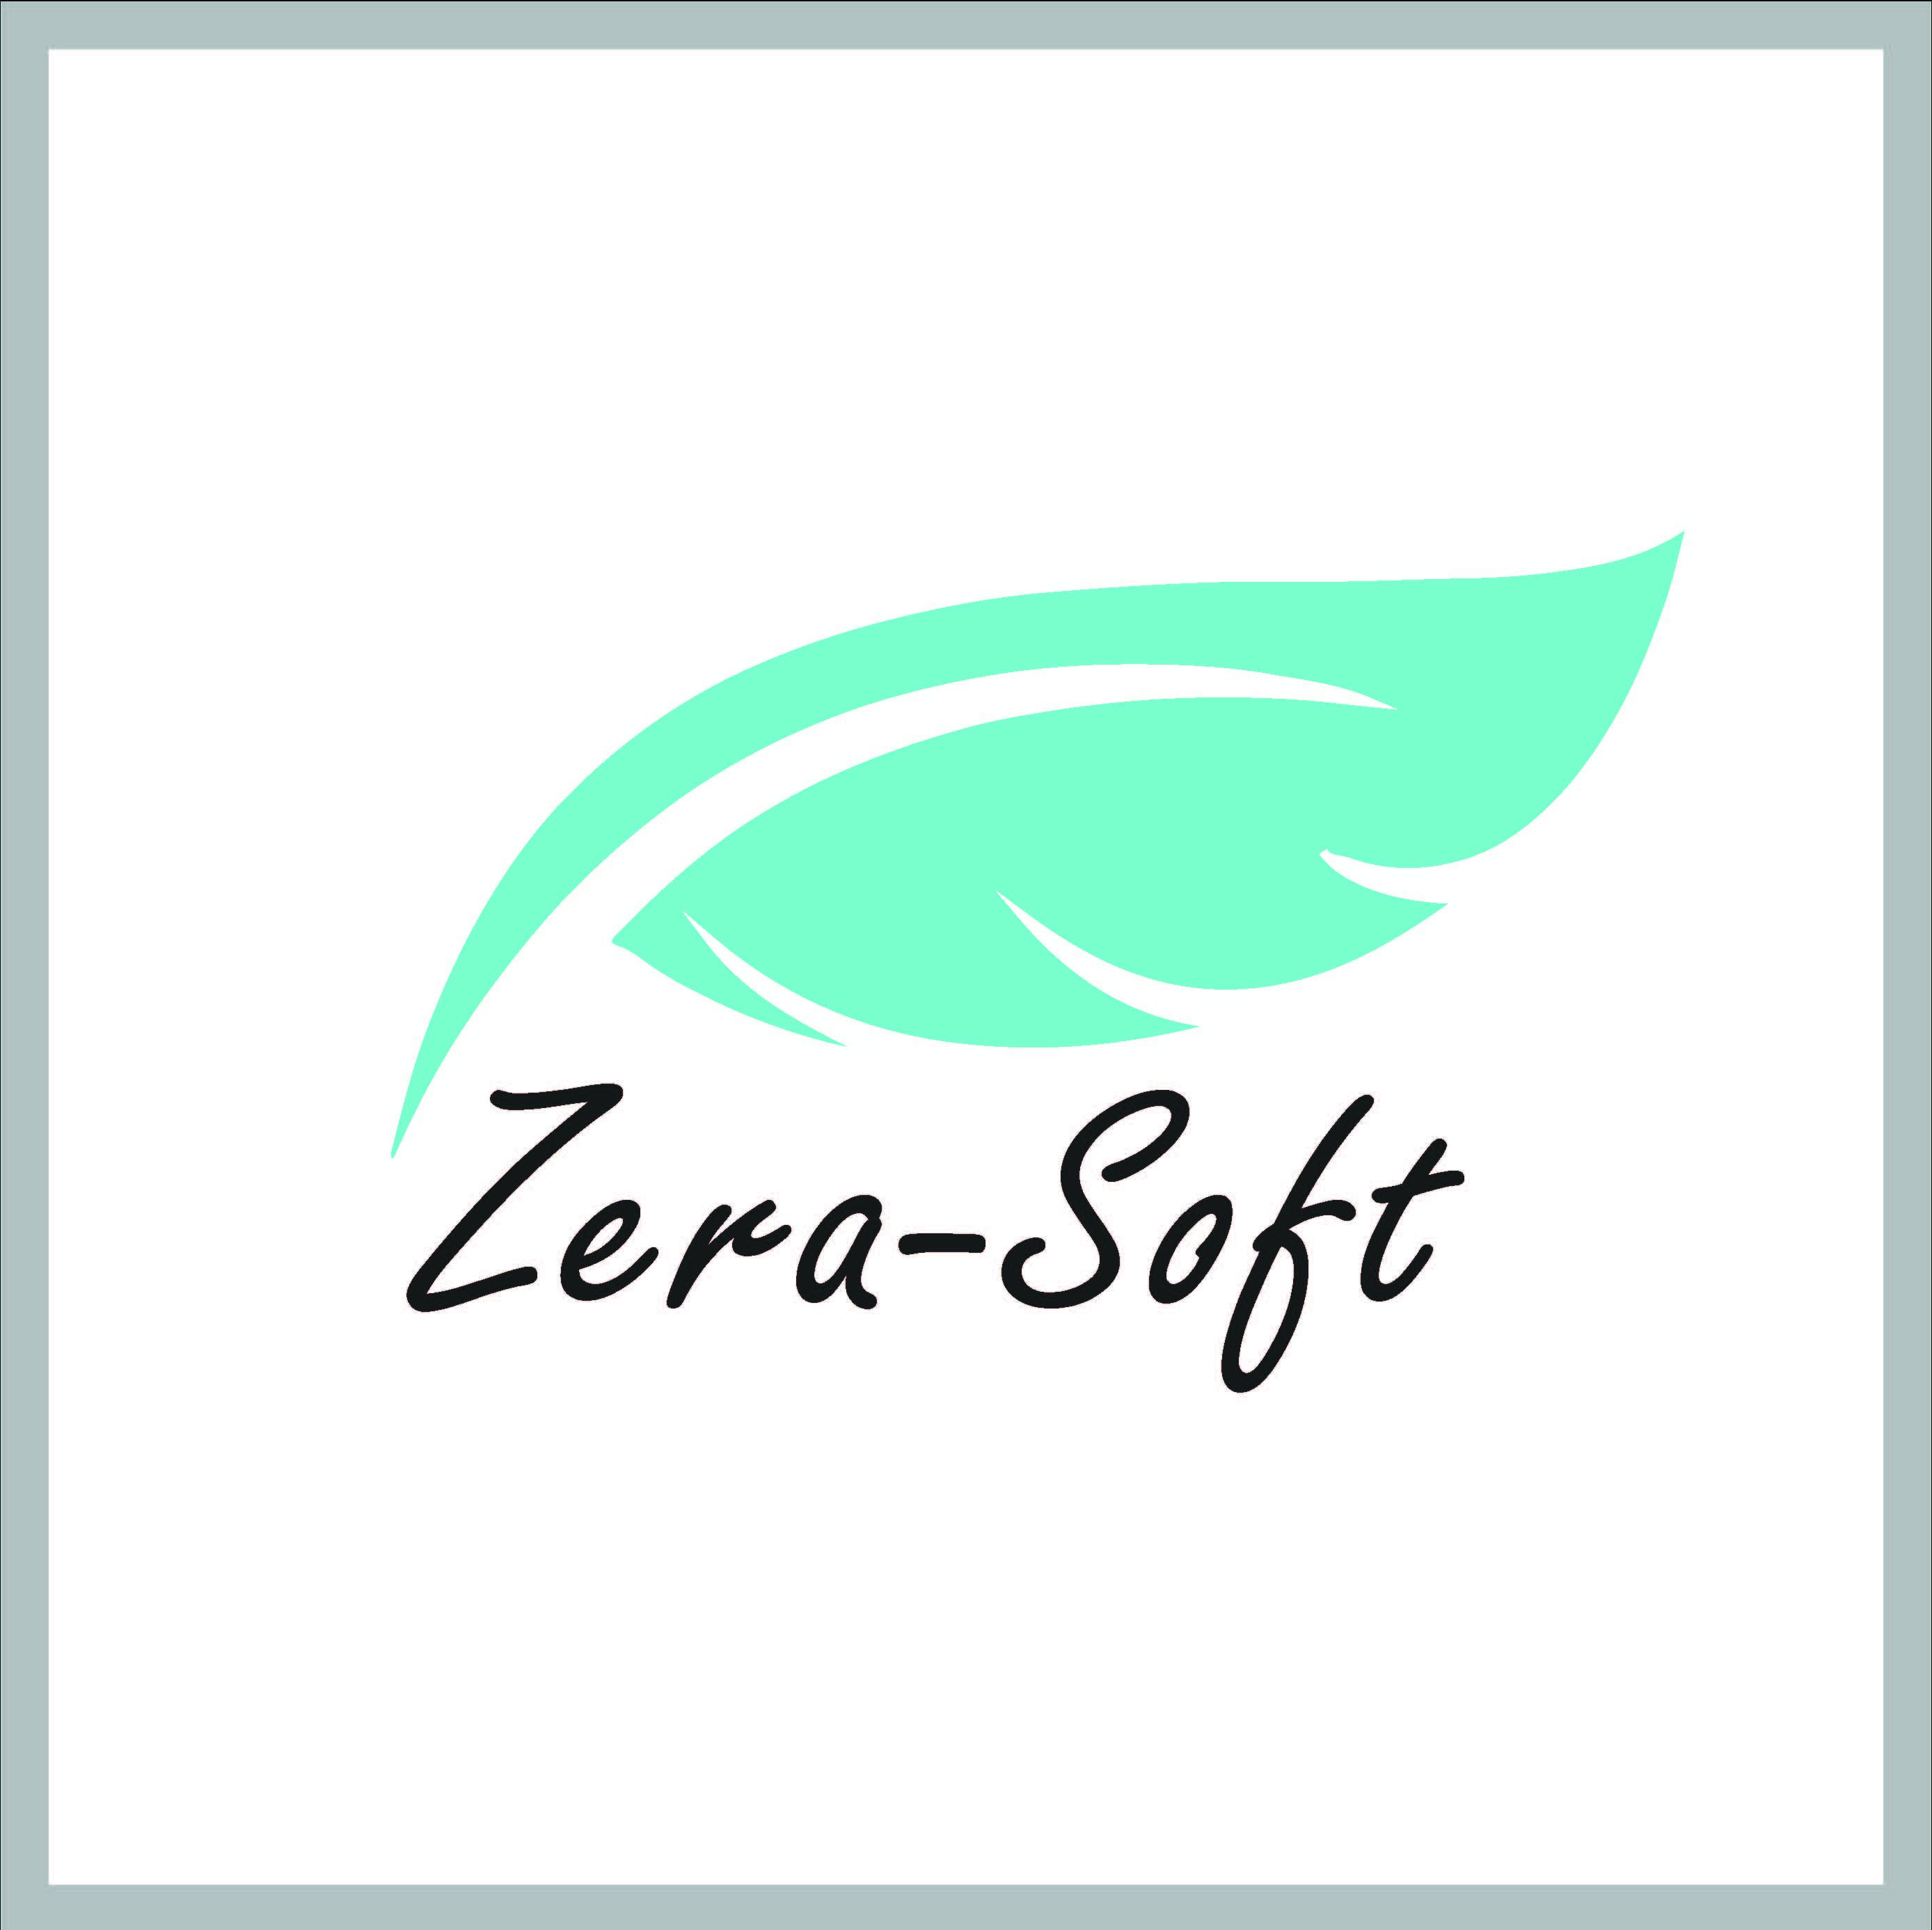 Zera-soft hangtag